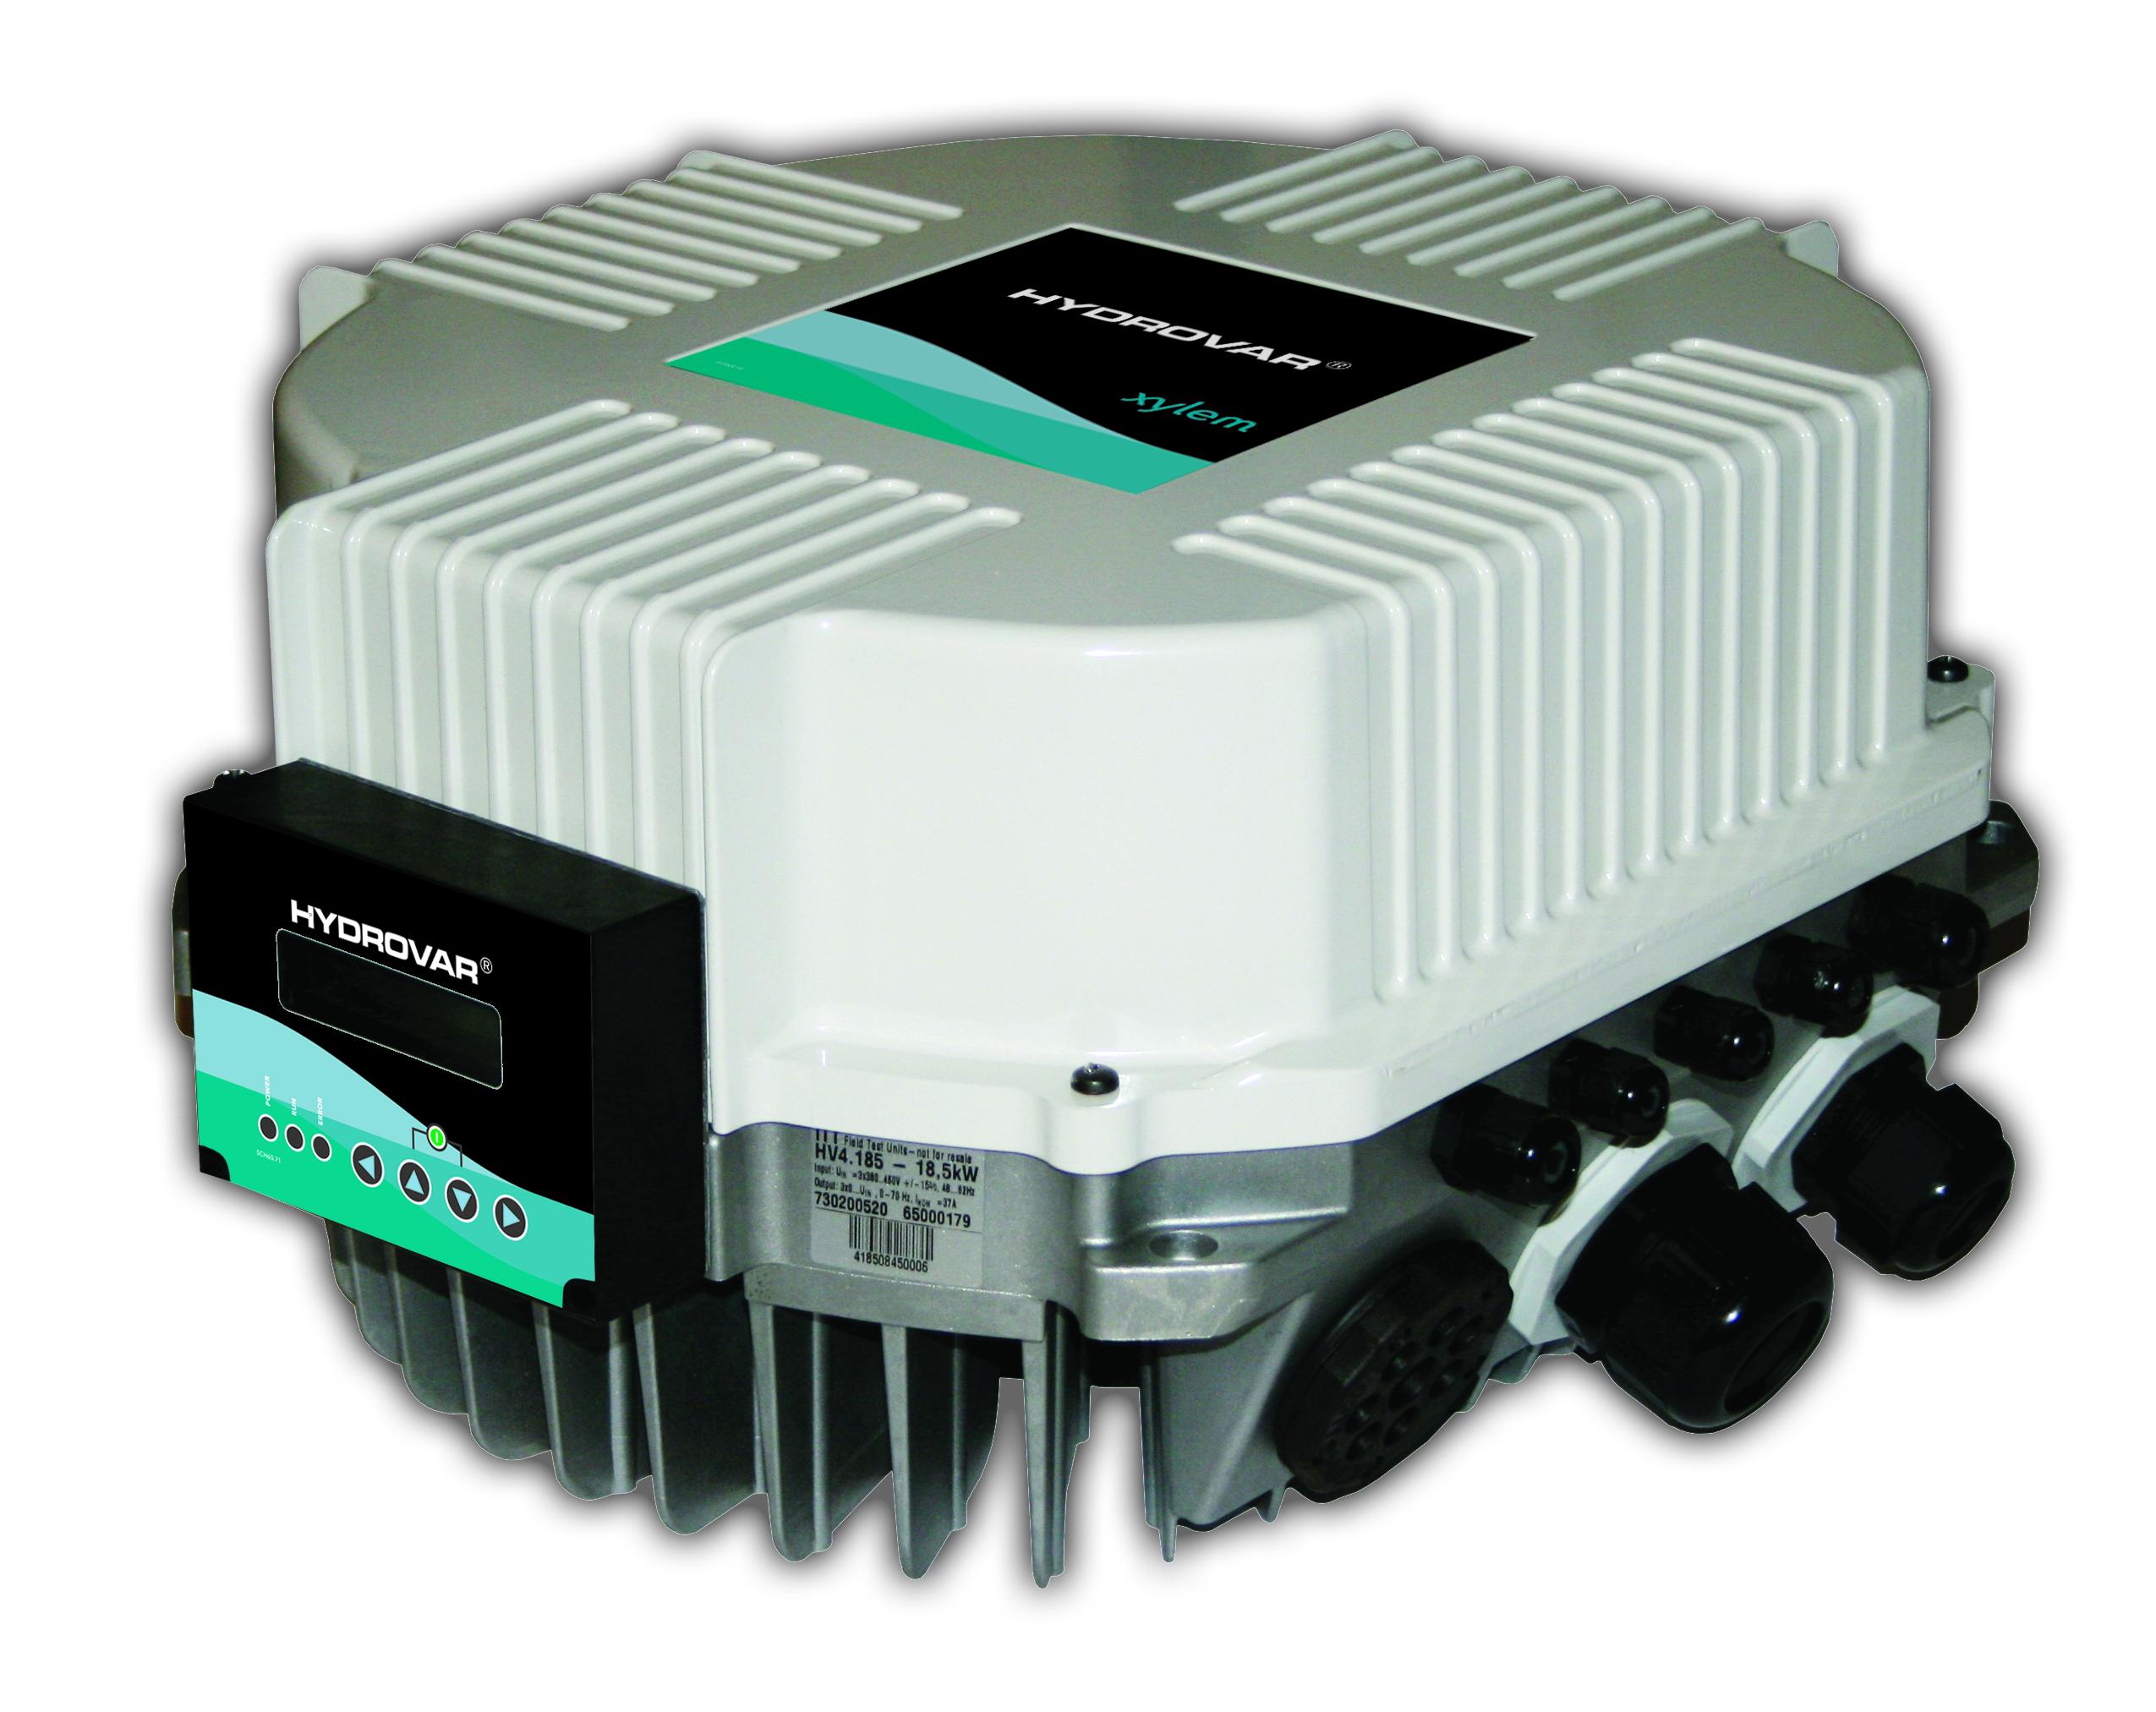 variateur de vitesse Hydrovar Xylem